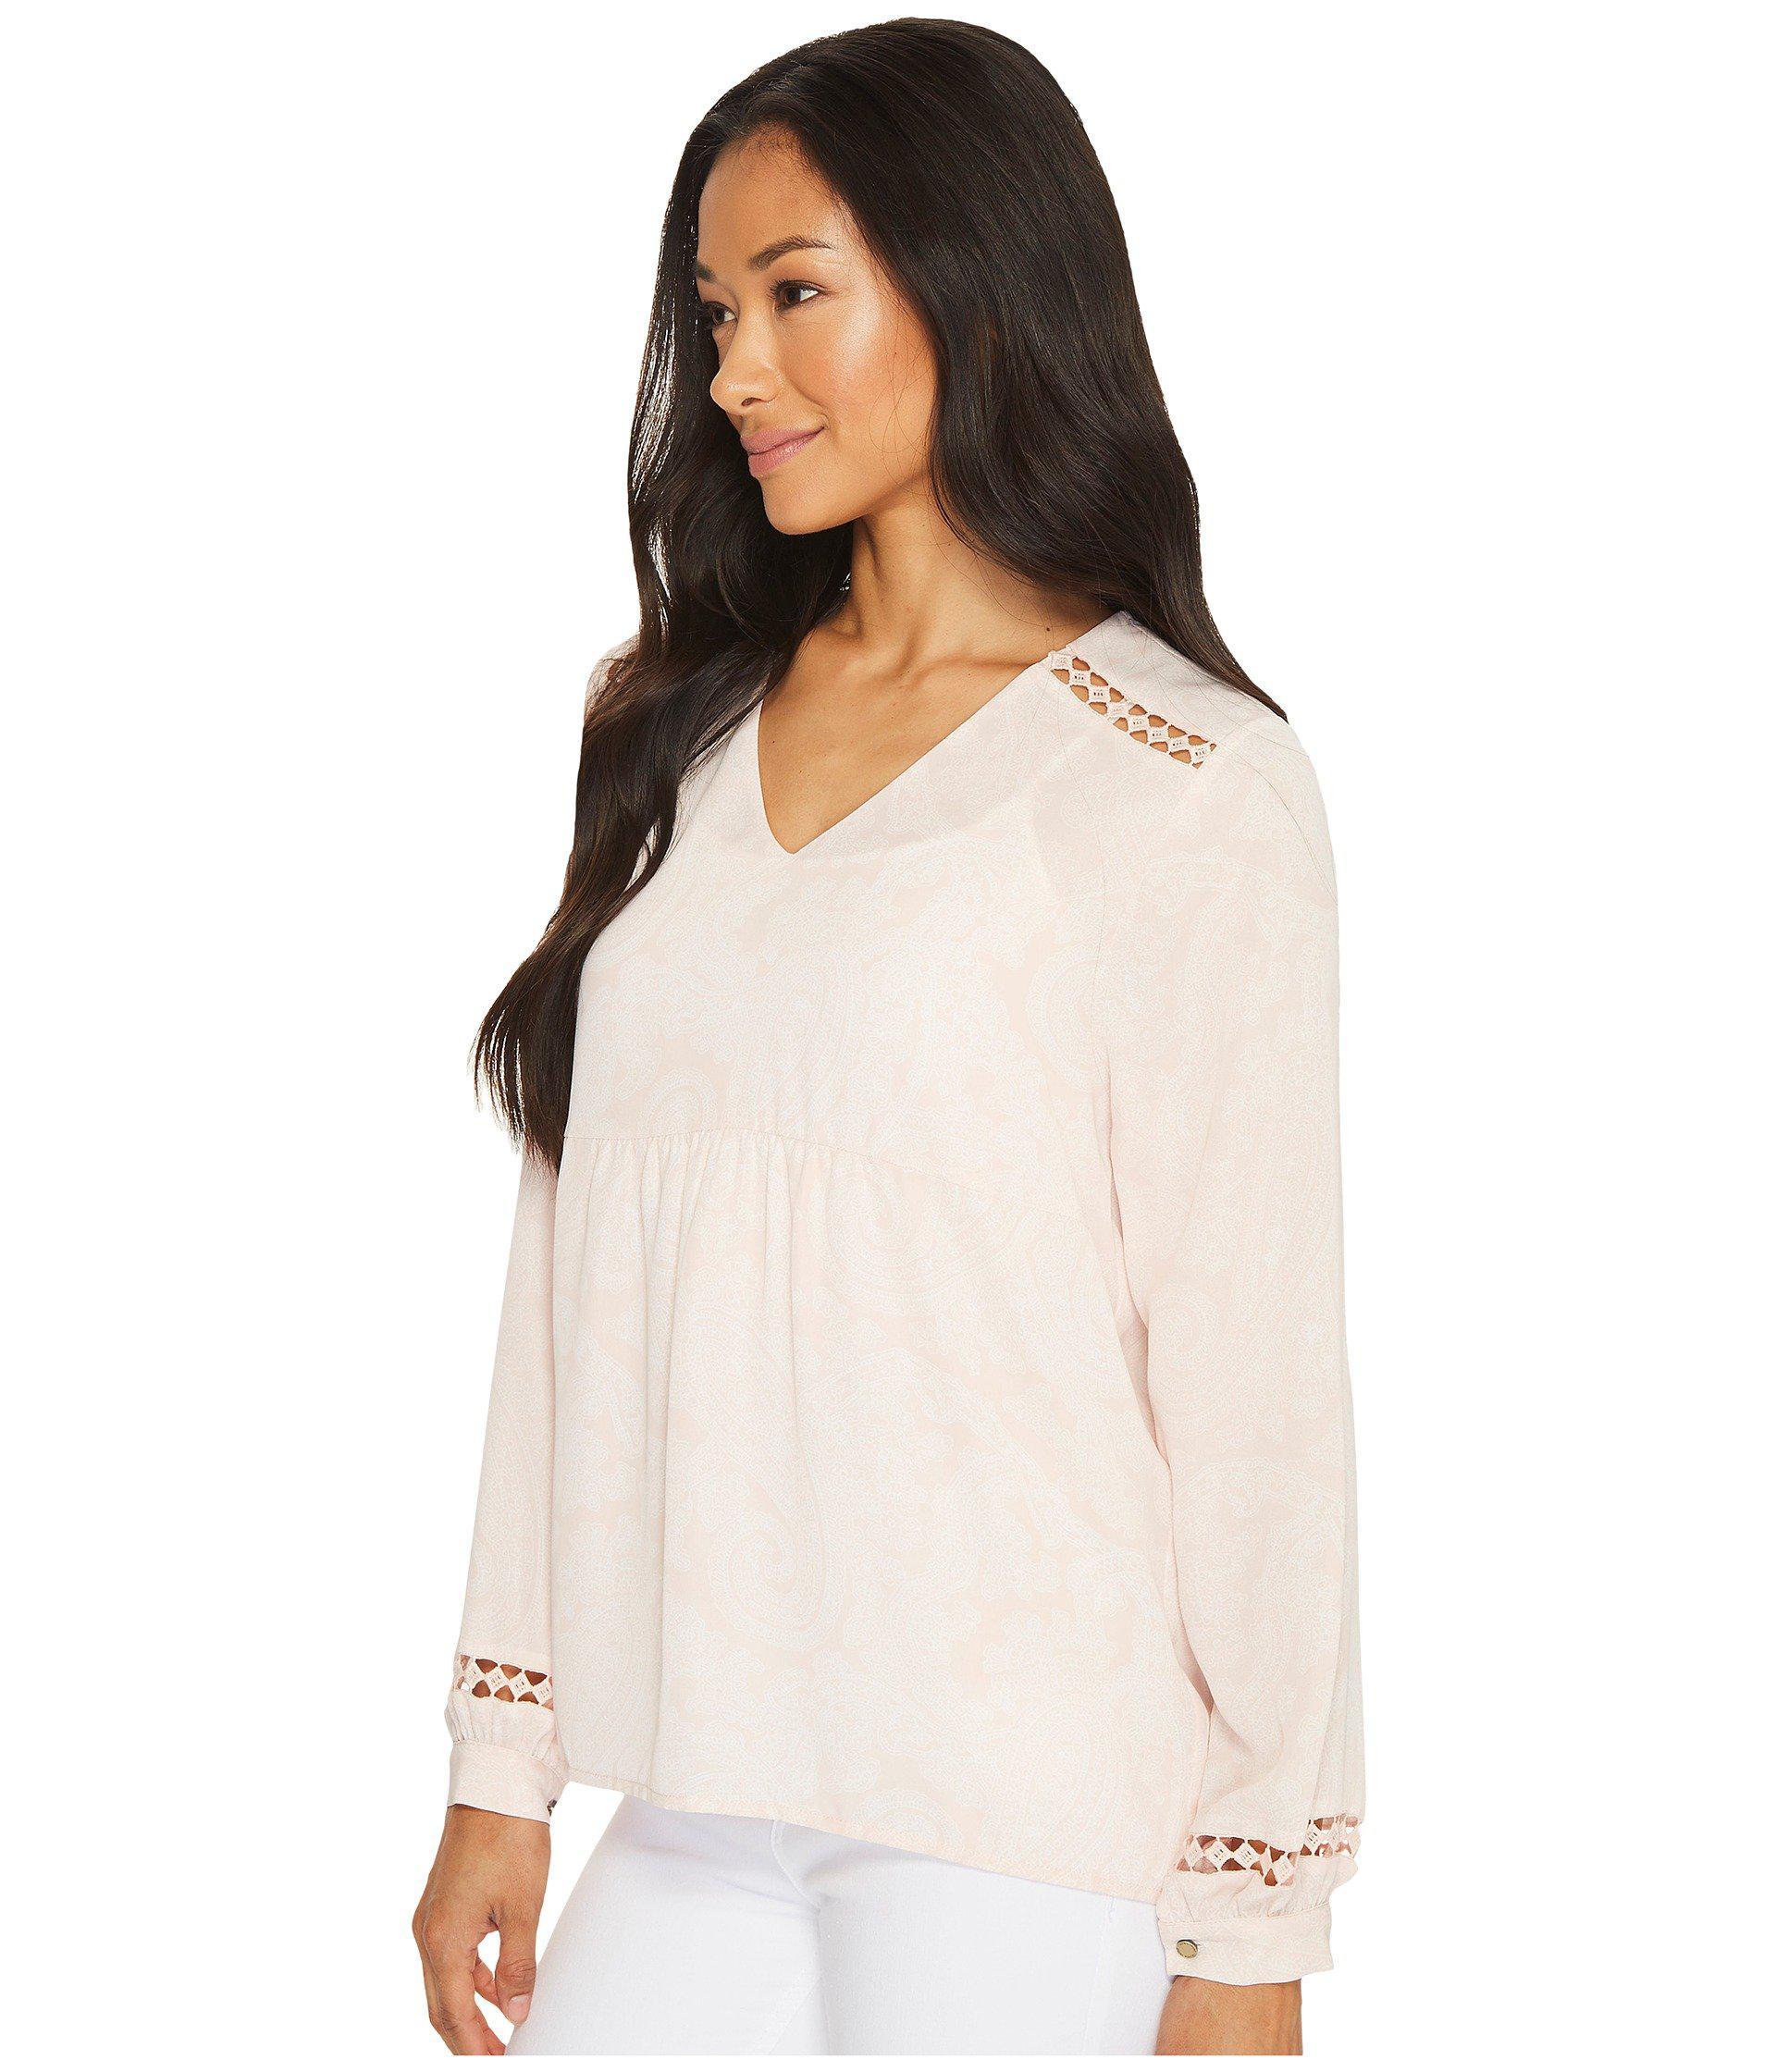 324c56158297d Lyst - Ivanka Trump Georgette Long Sleeve Blouse - Save 13%